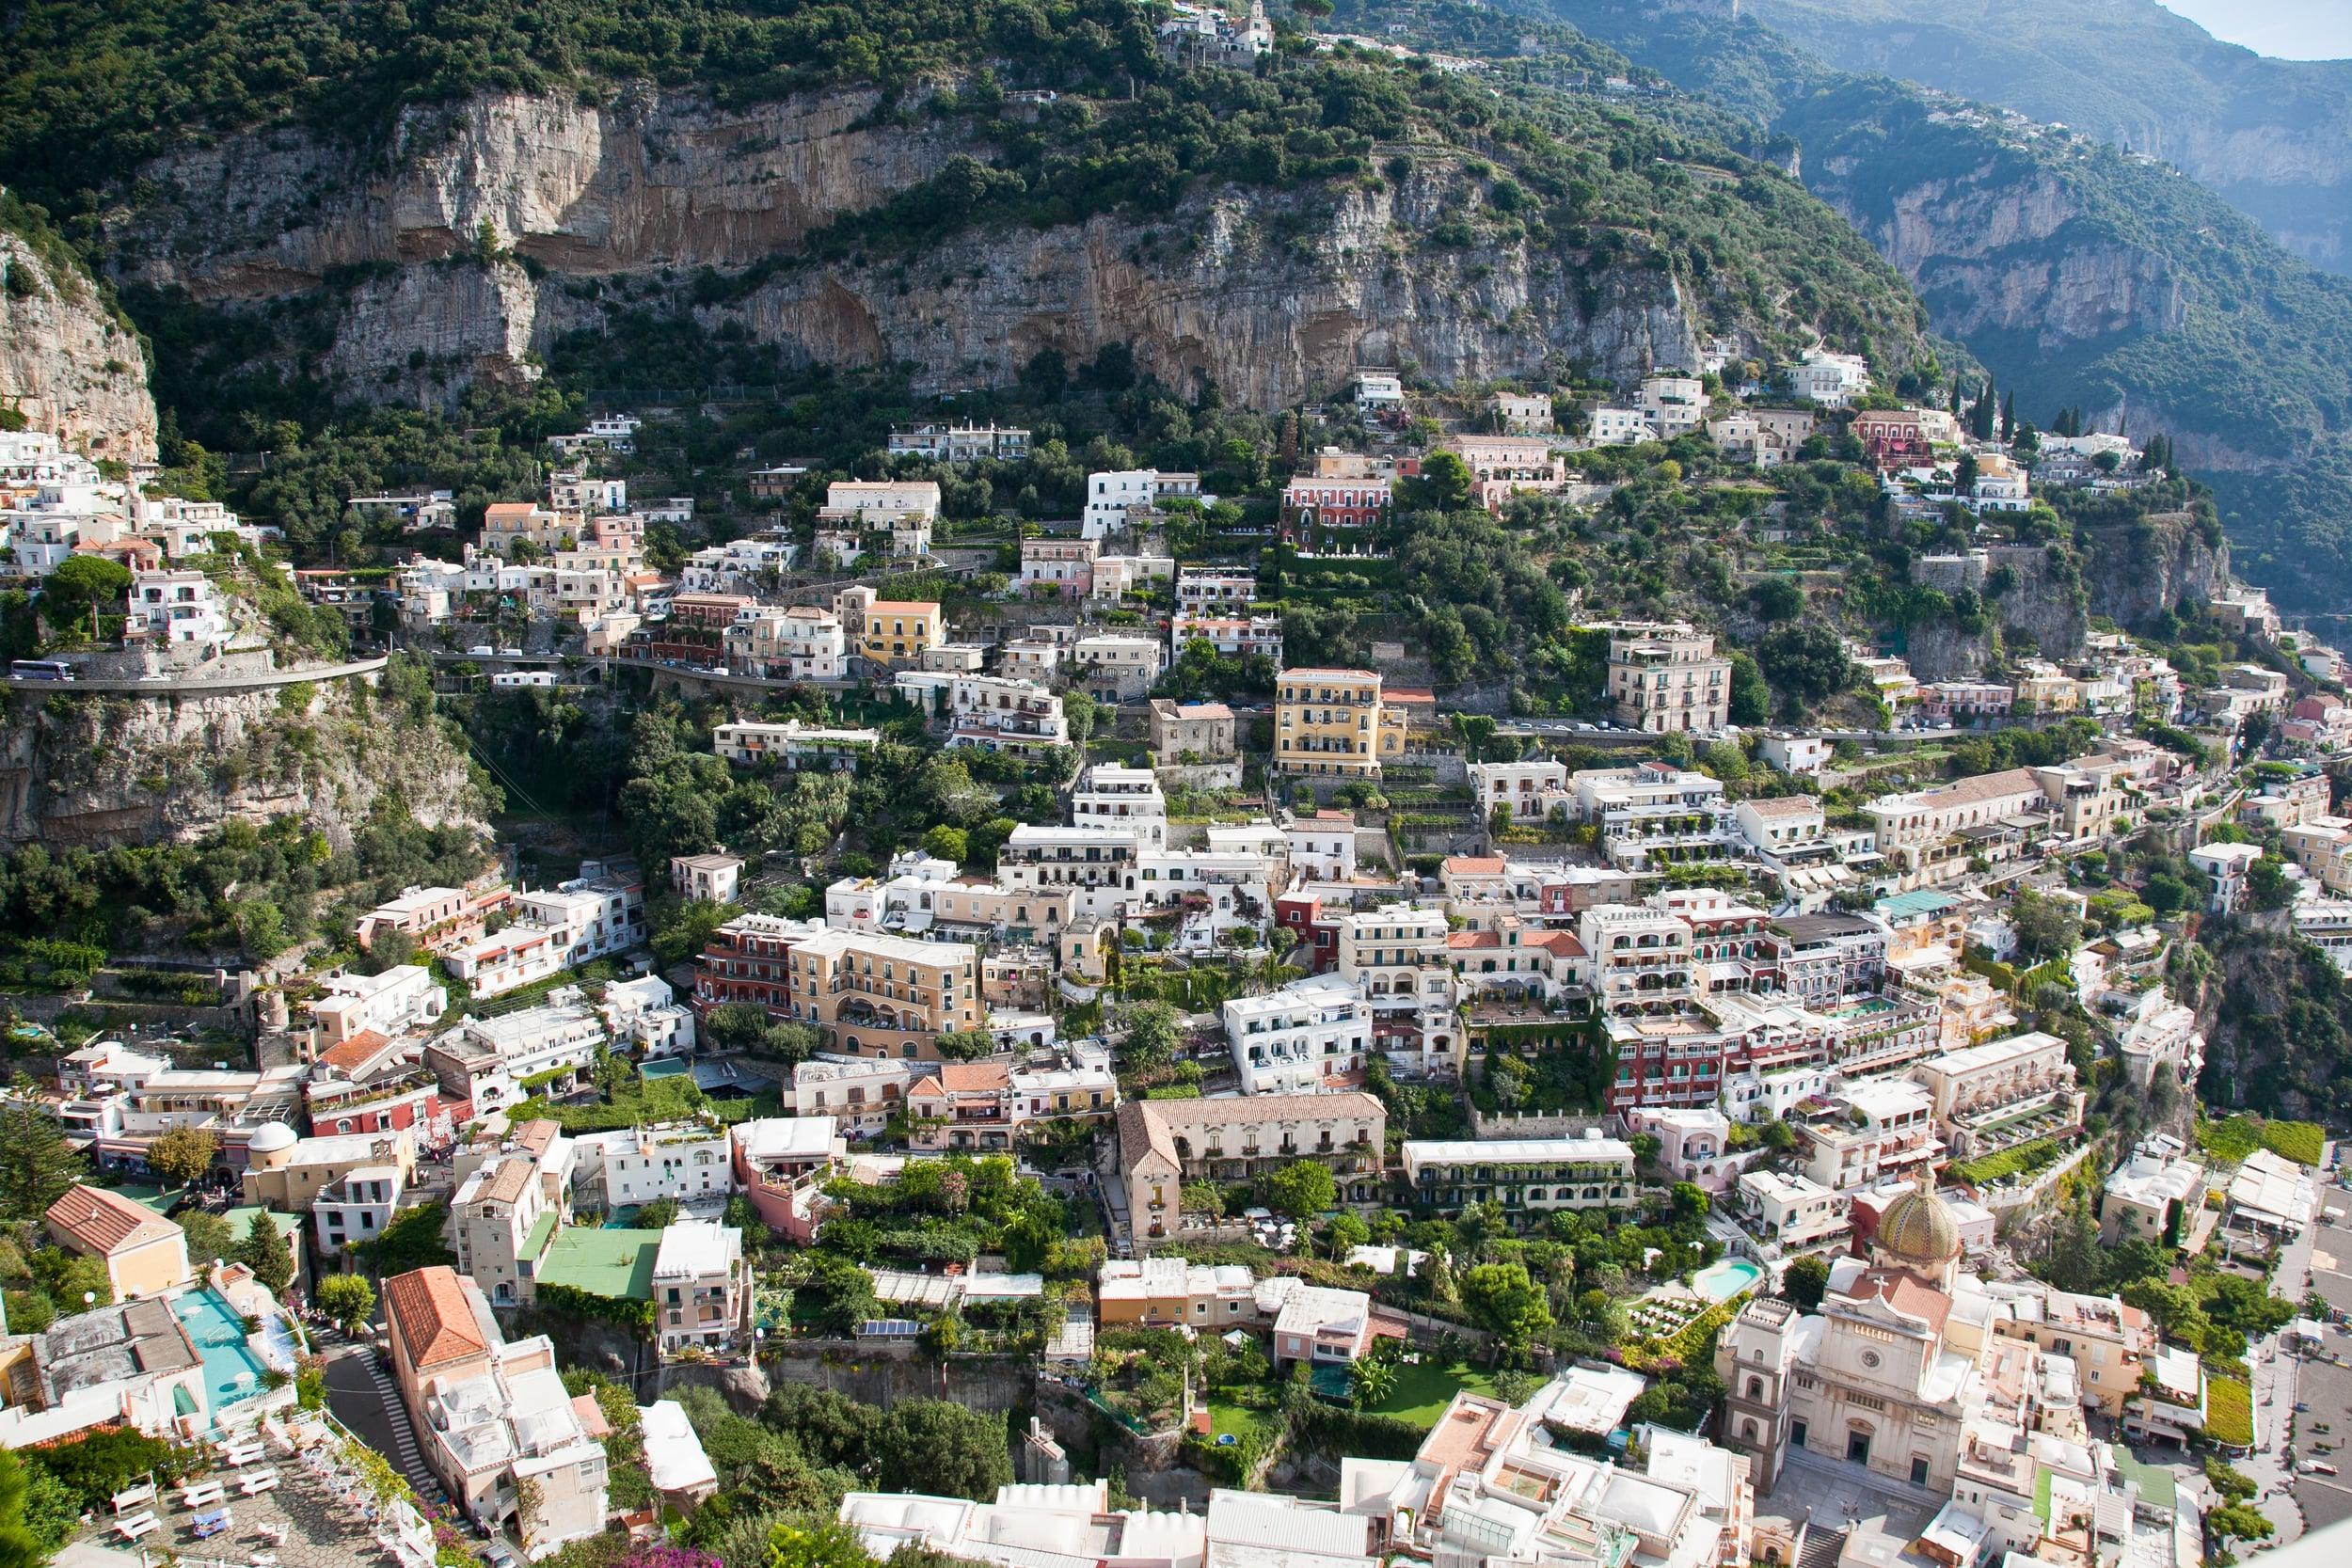 trisa-taro-positano-houses-amalfi coast-italy.jpg